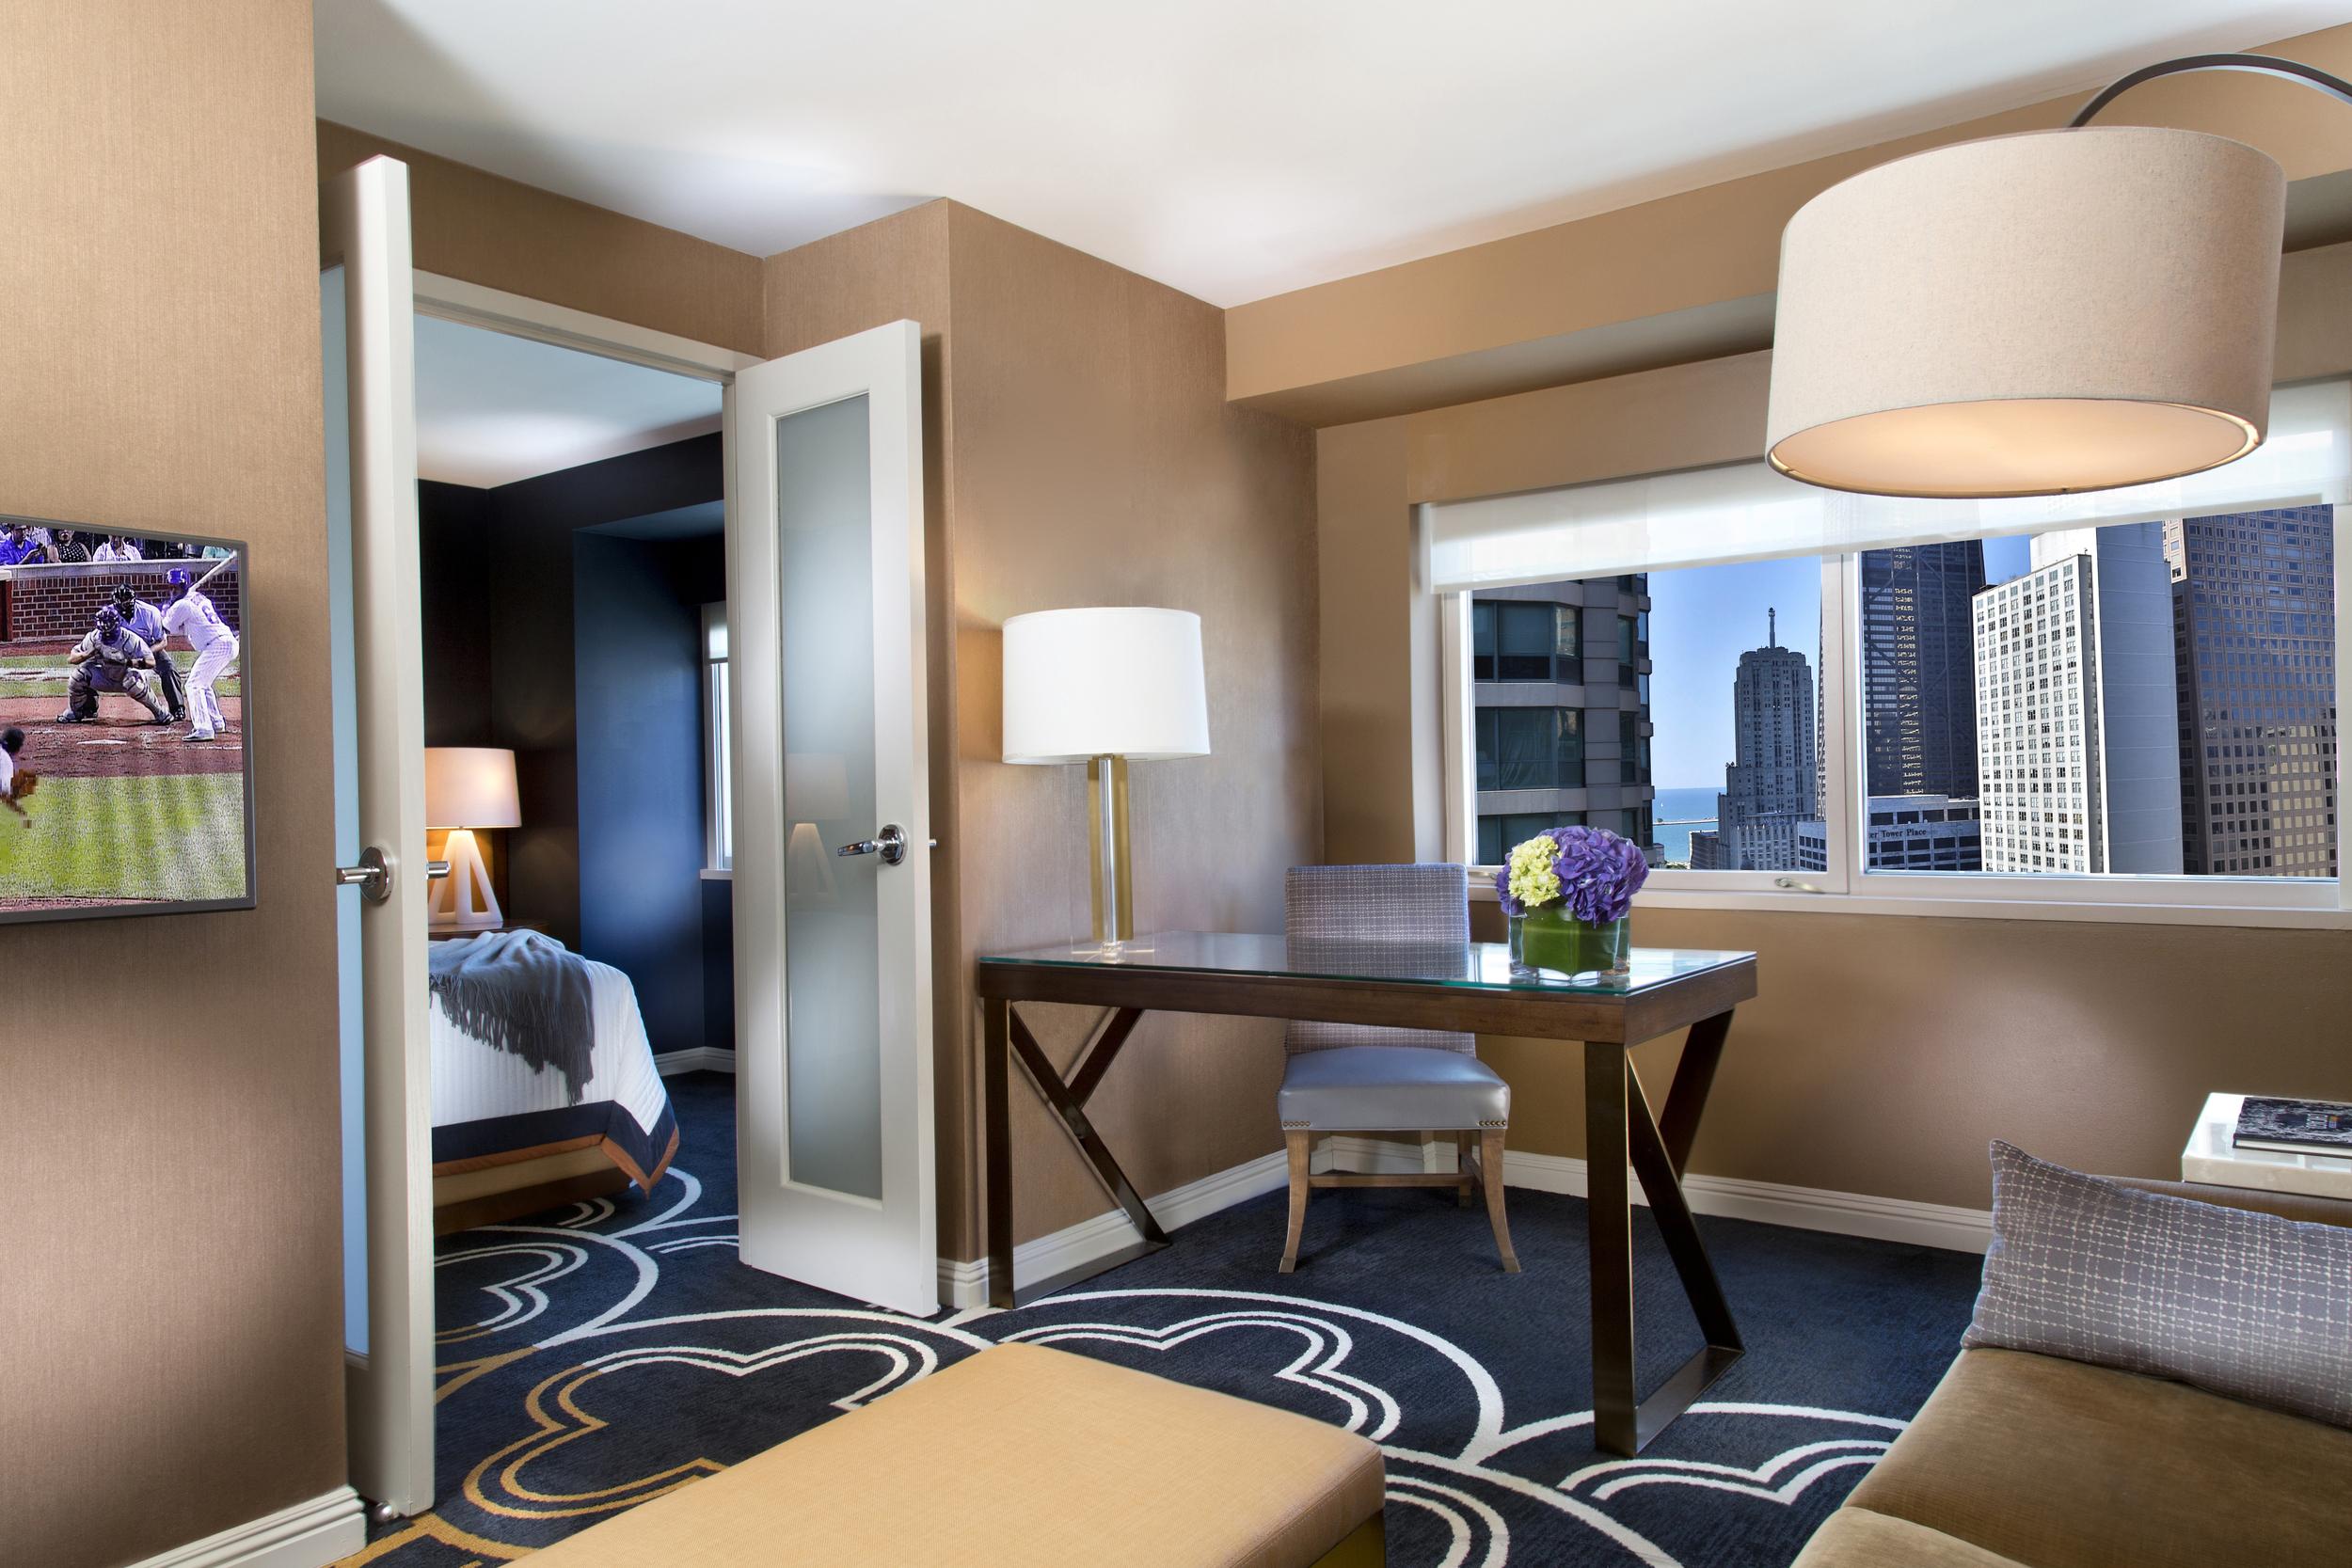 2/Omni Hotel Chicago